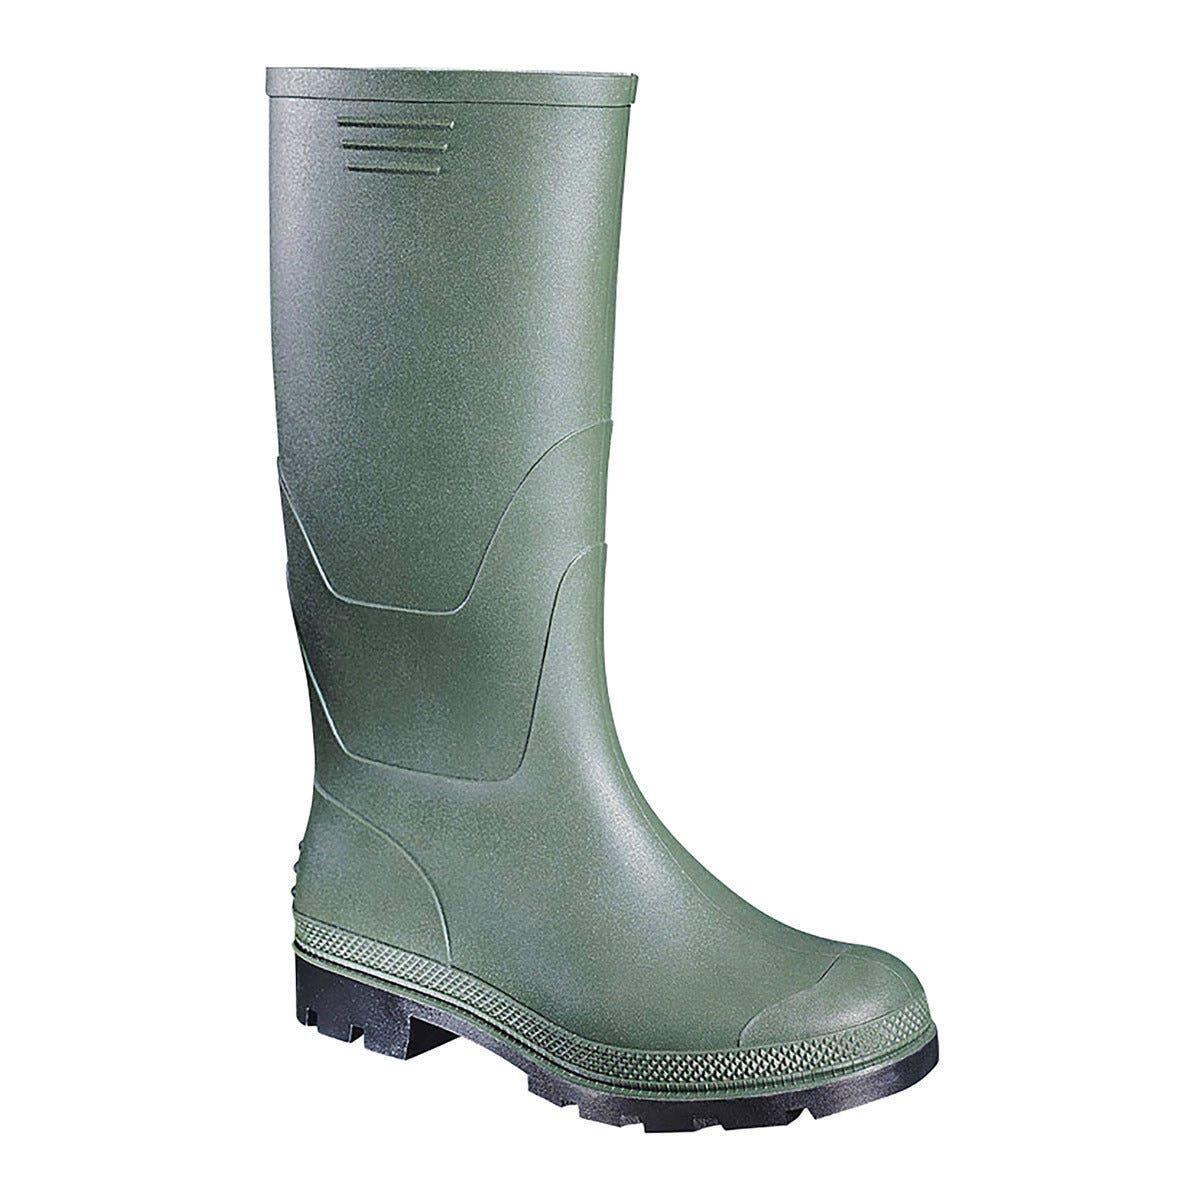 Stivale Ginocchio Pvc Misura 45 Boots Company